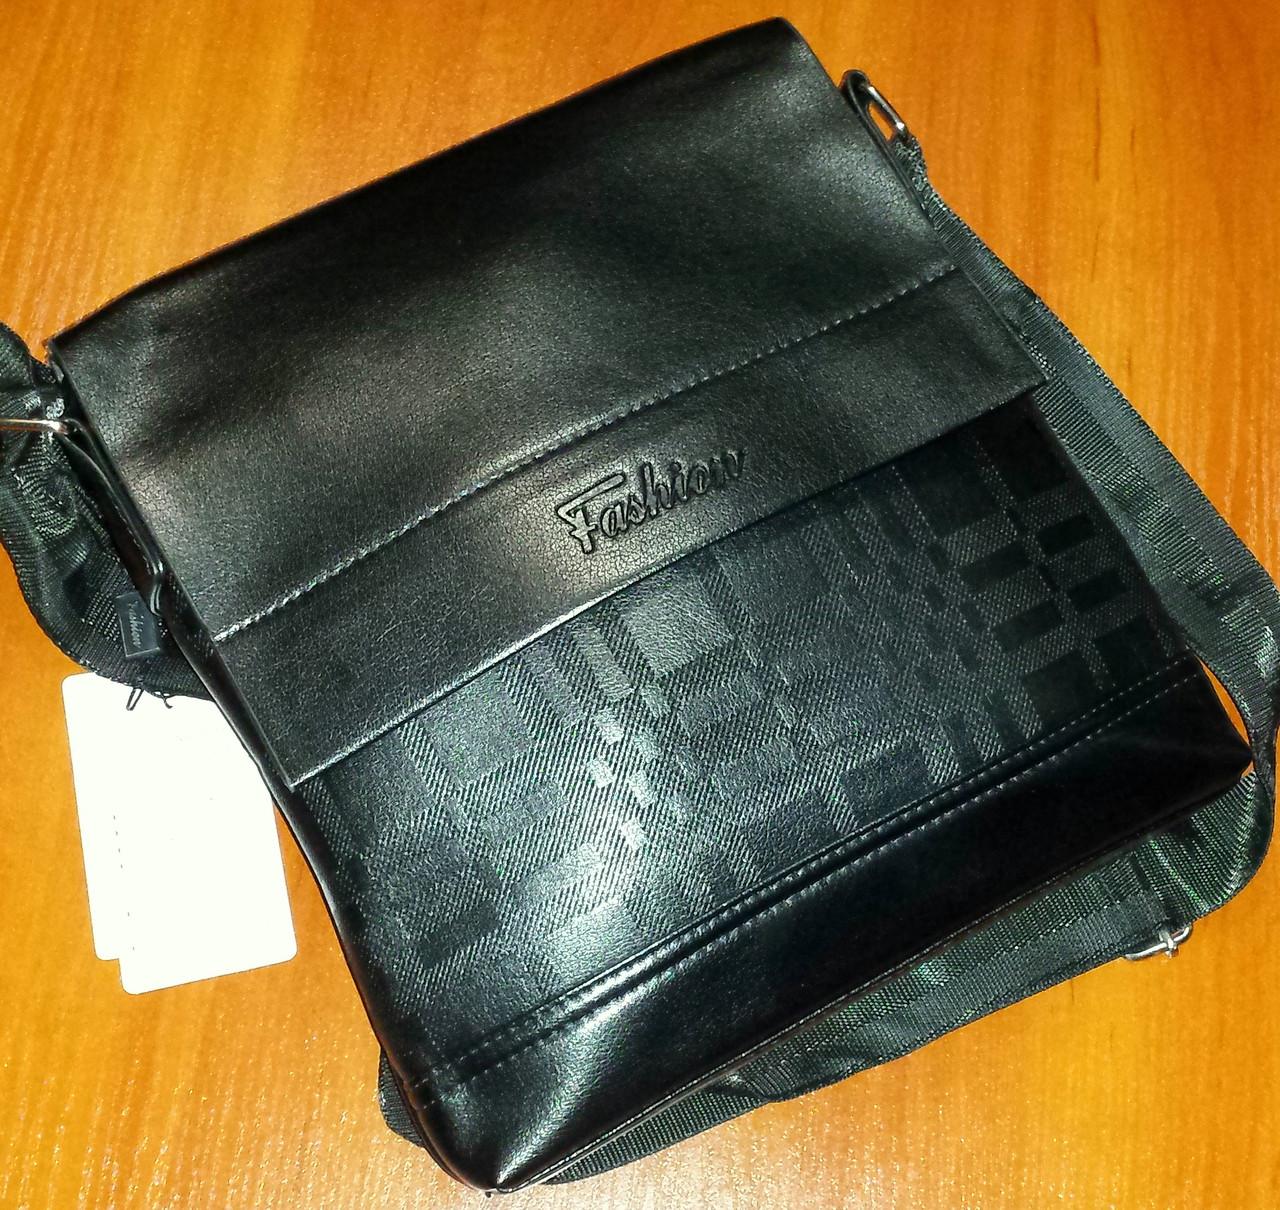 379d417a9fd7 Мужская фирменная сумка Fashion 29x25x8см (059-08): продажа, цена в ...